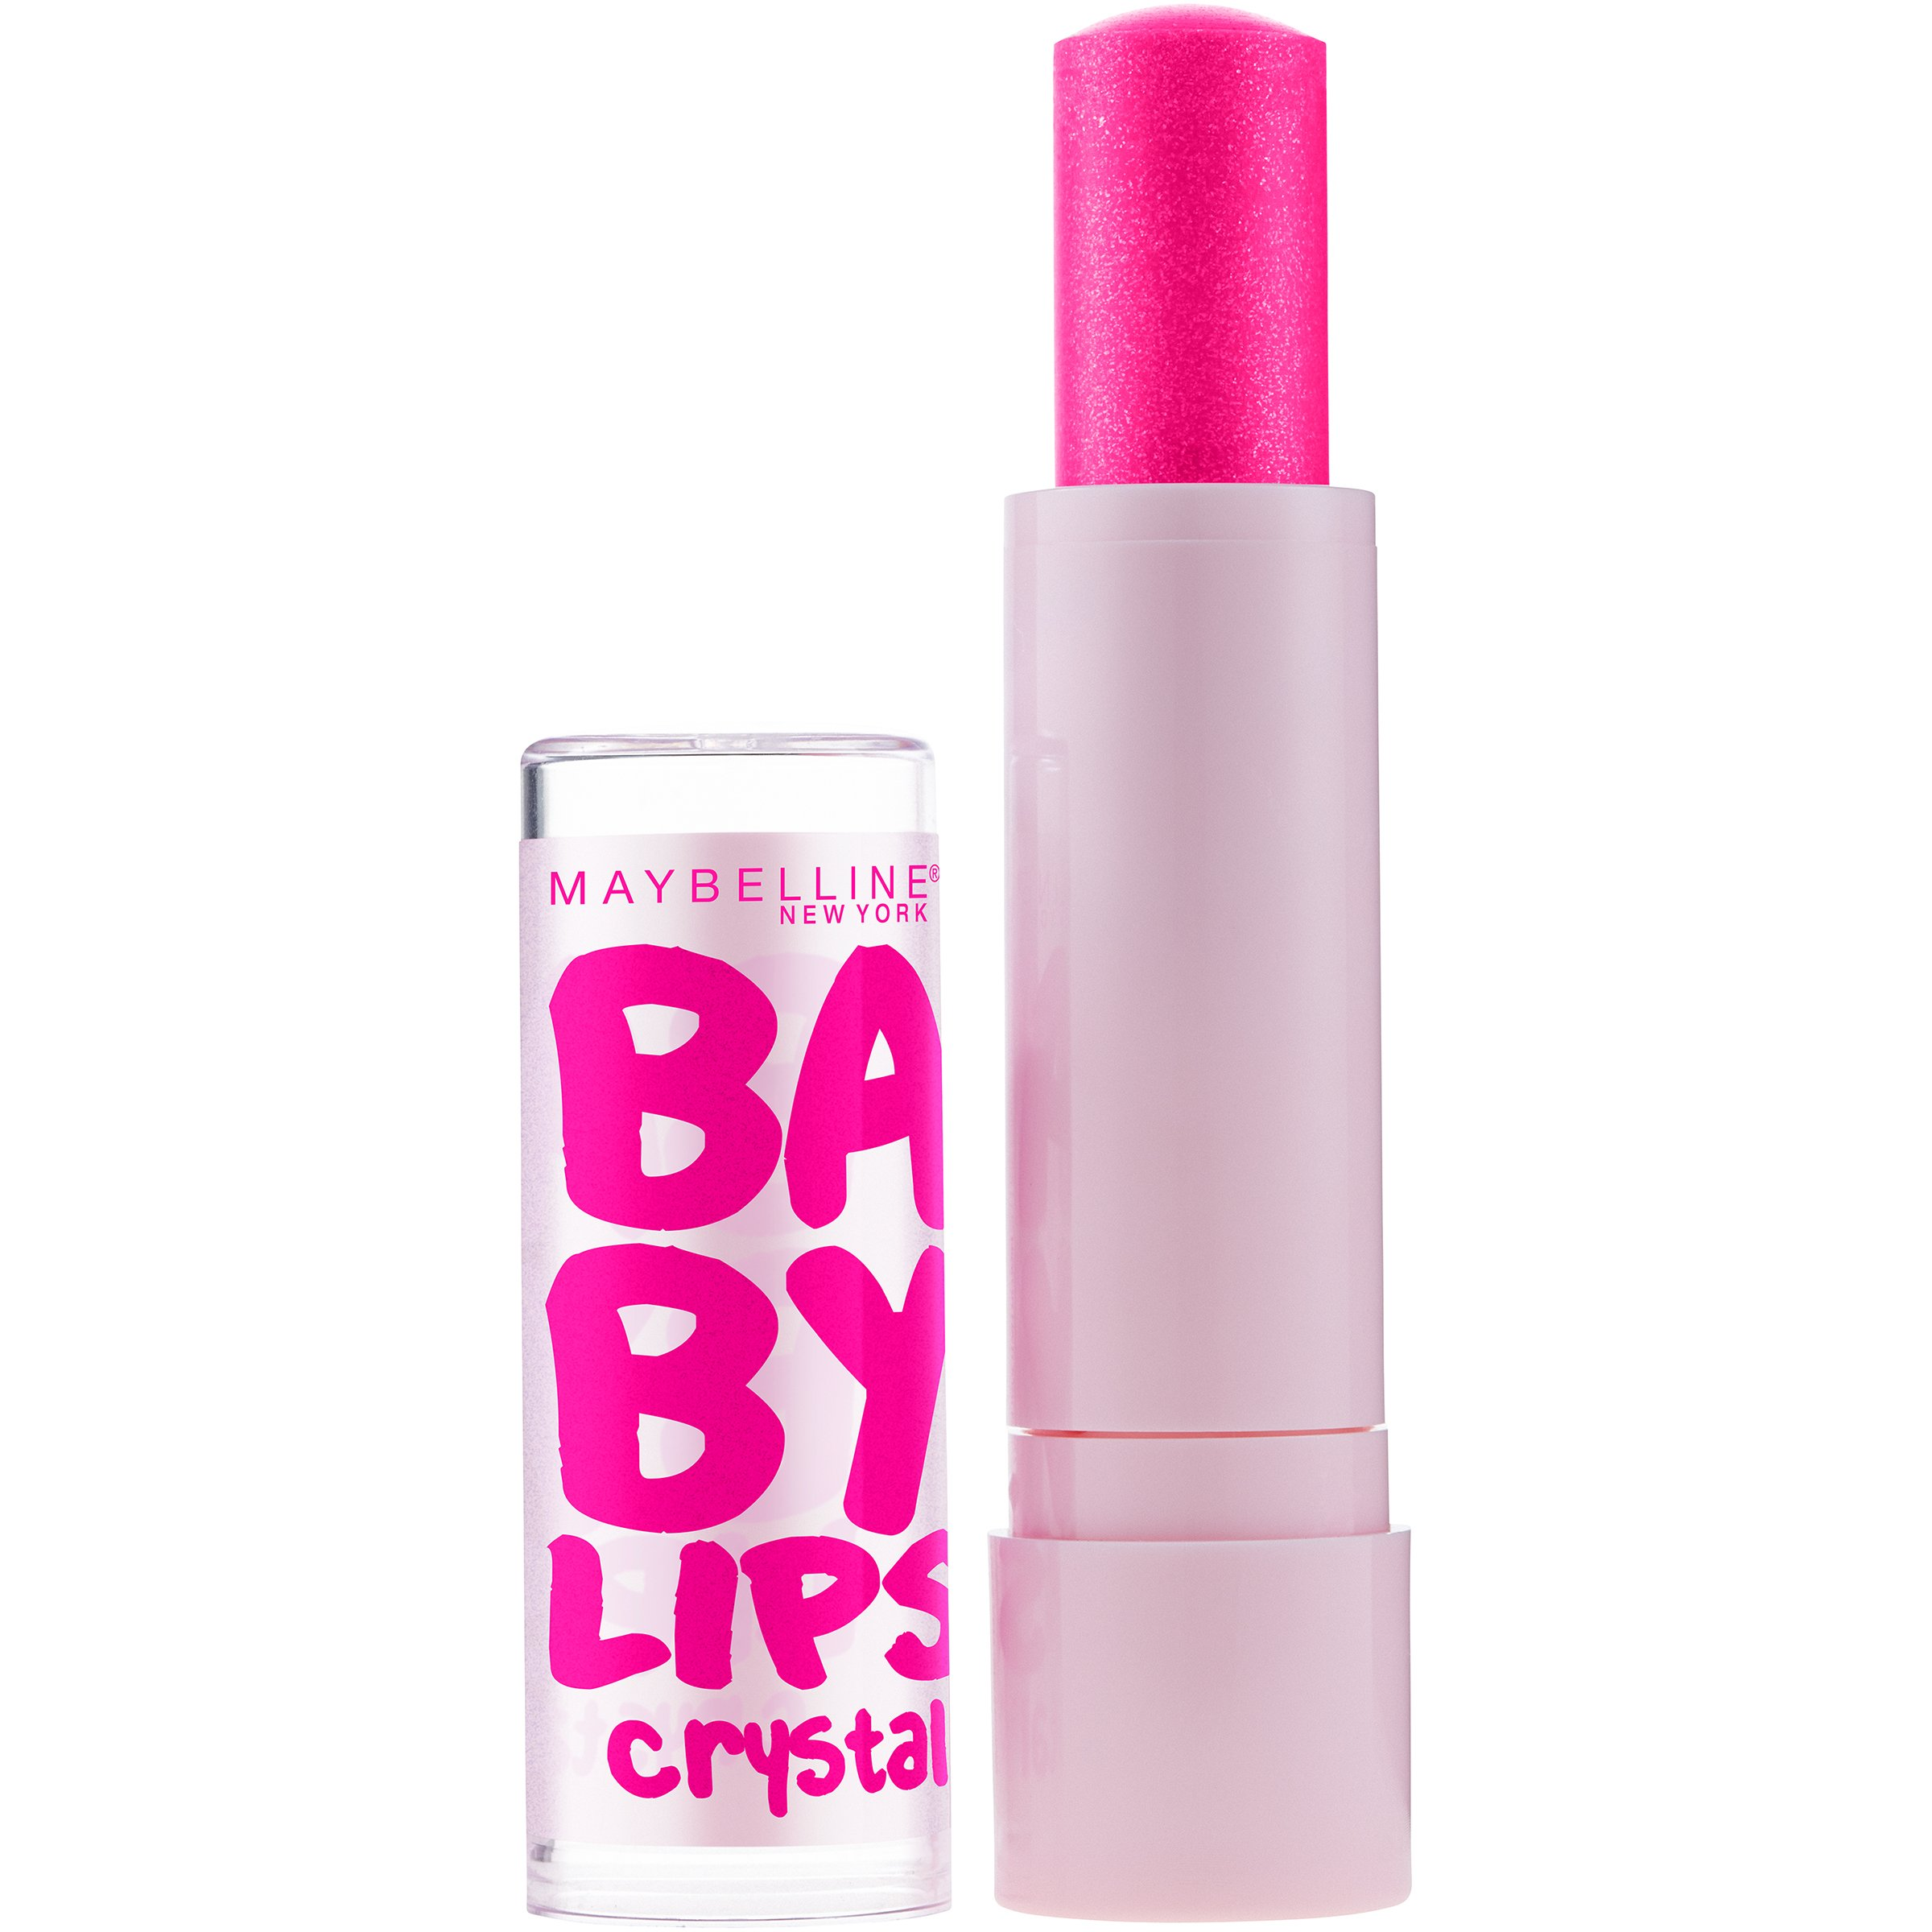 Maybelline New York Baby Lips Crystal Lip Balm, Pink Quartz [140] 0.15 oz